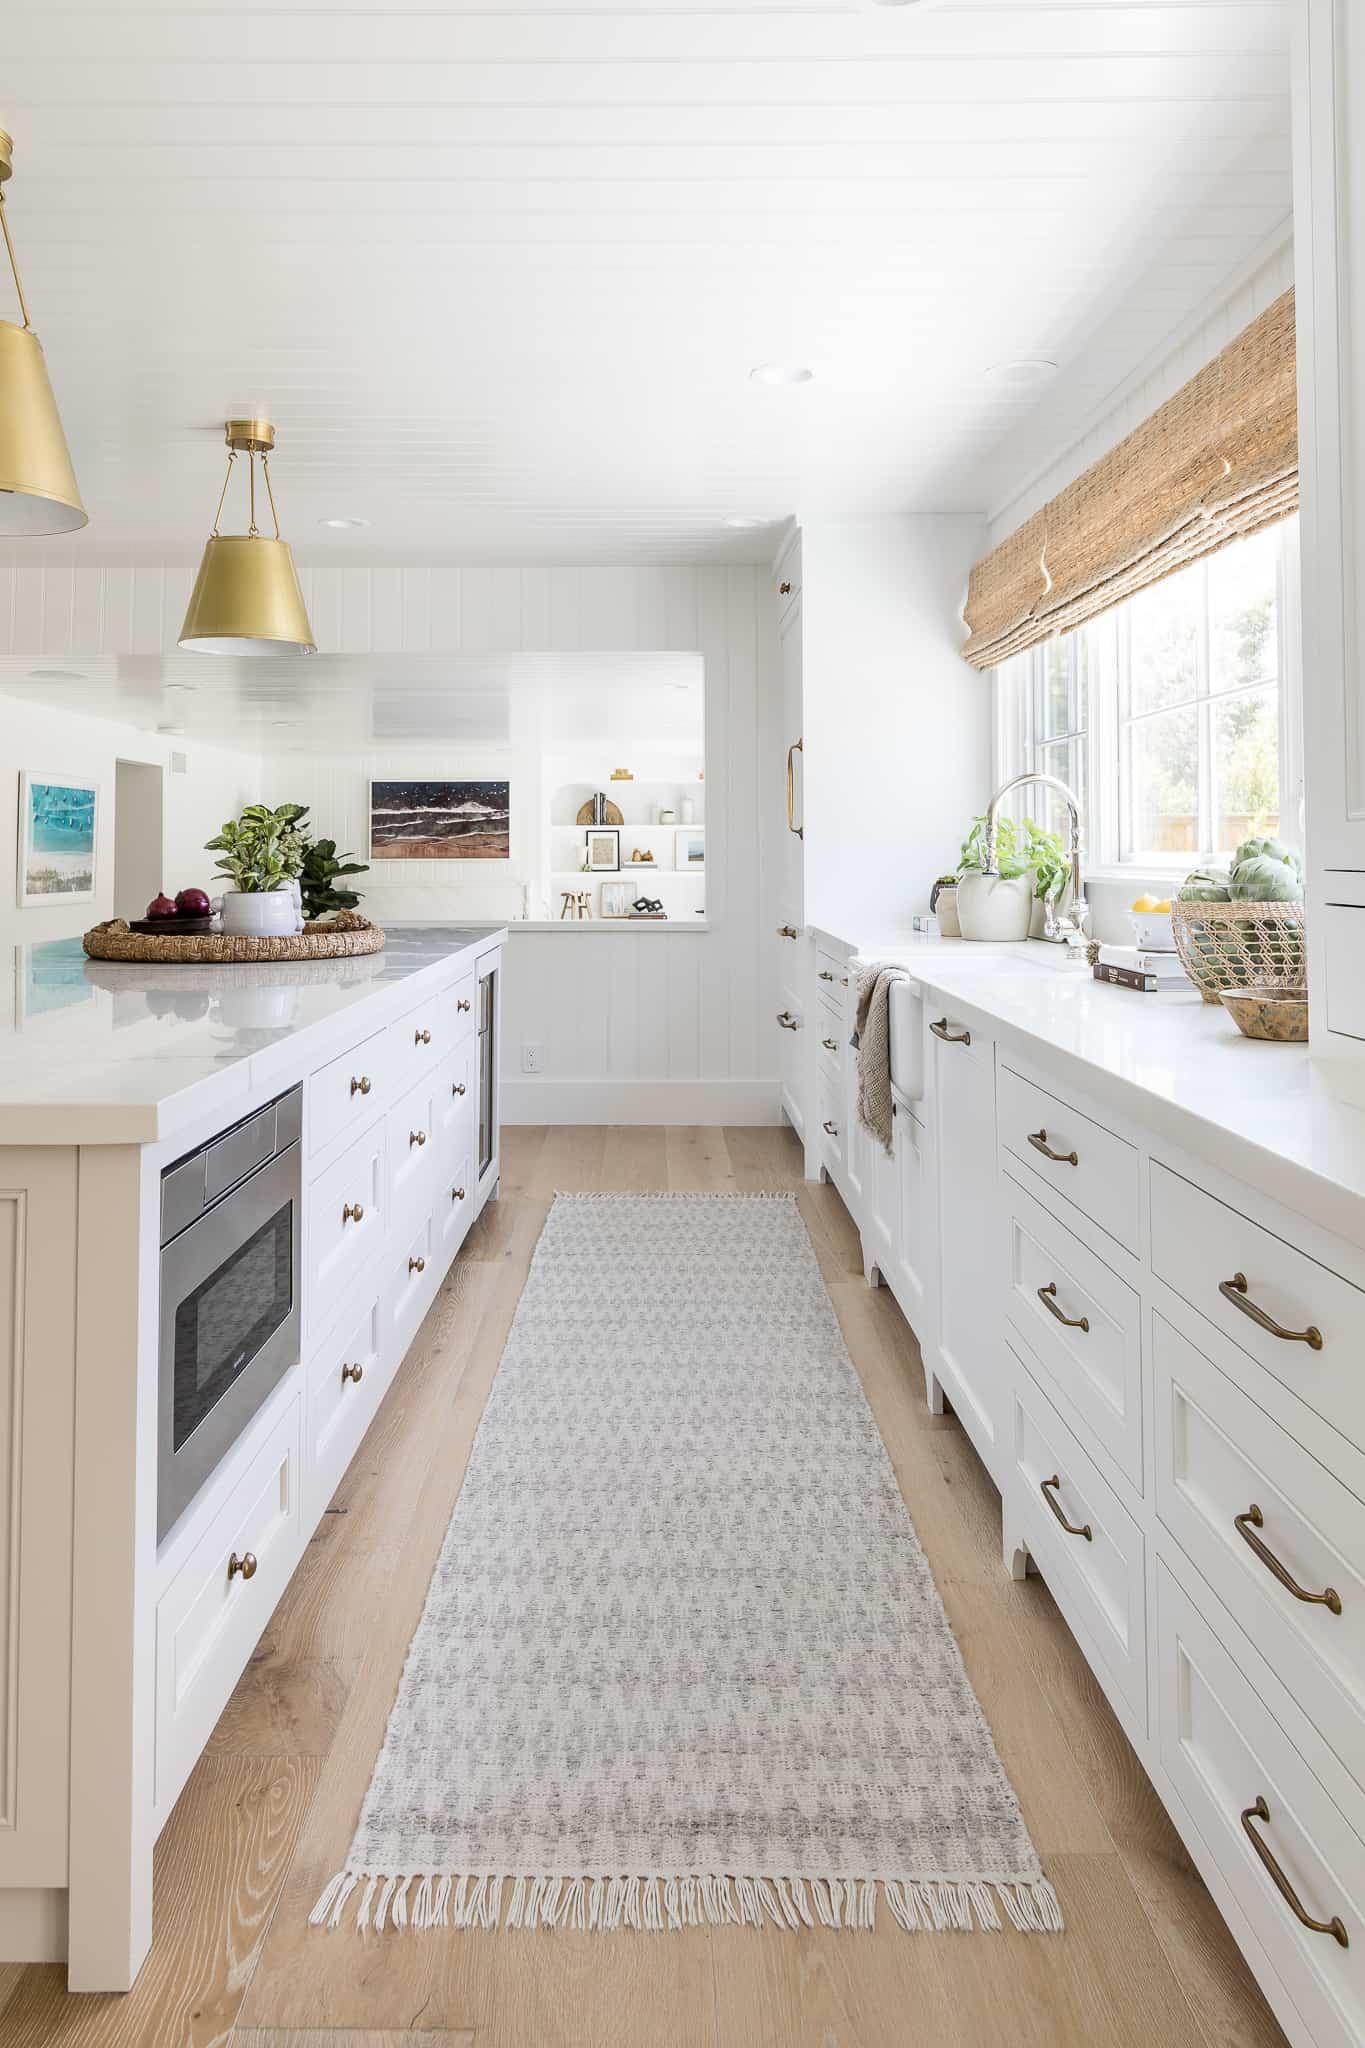 Port Newport Coastal Kitchen Design - Mindy Gayer Design Co.